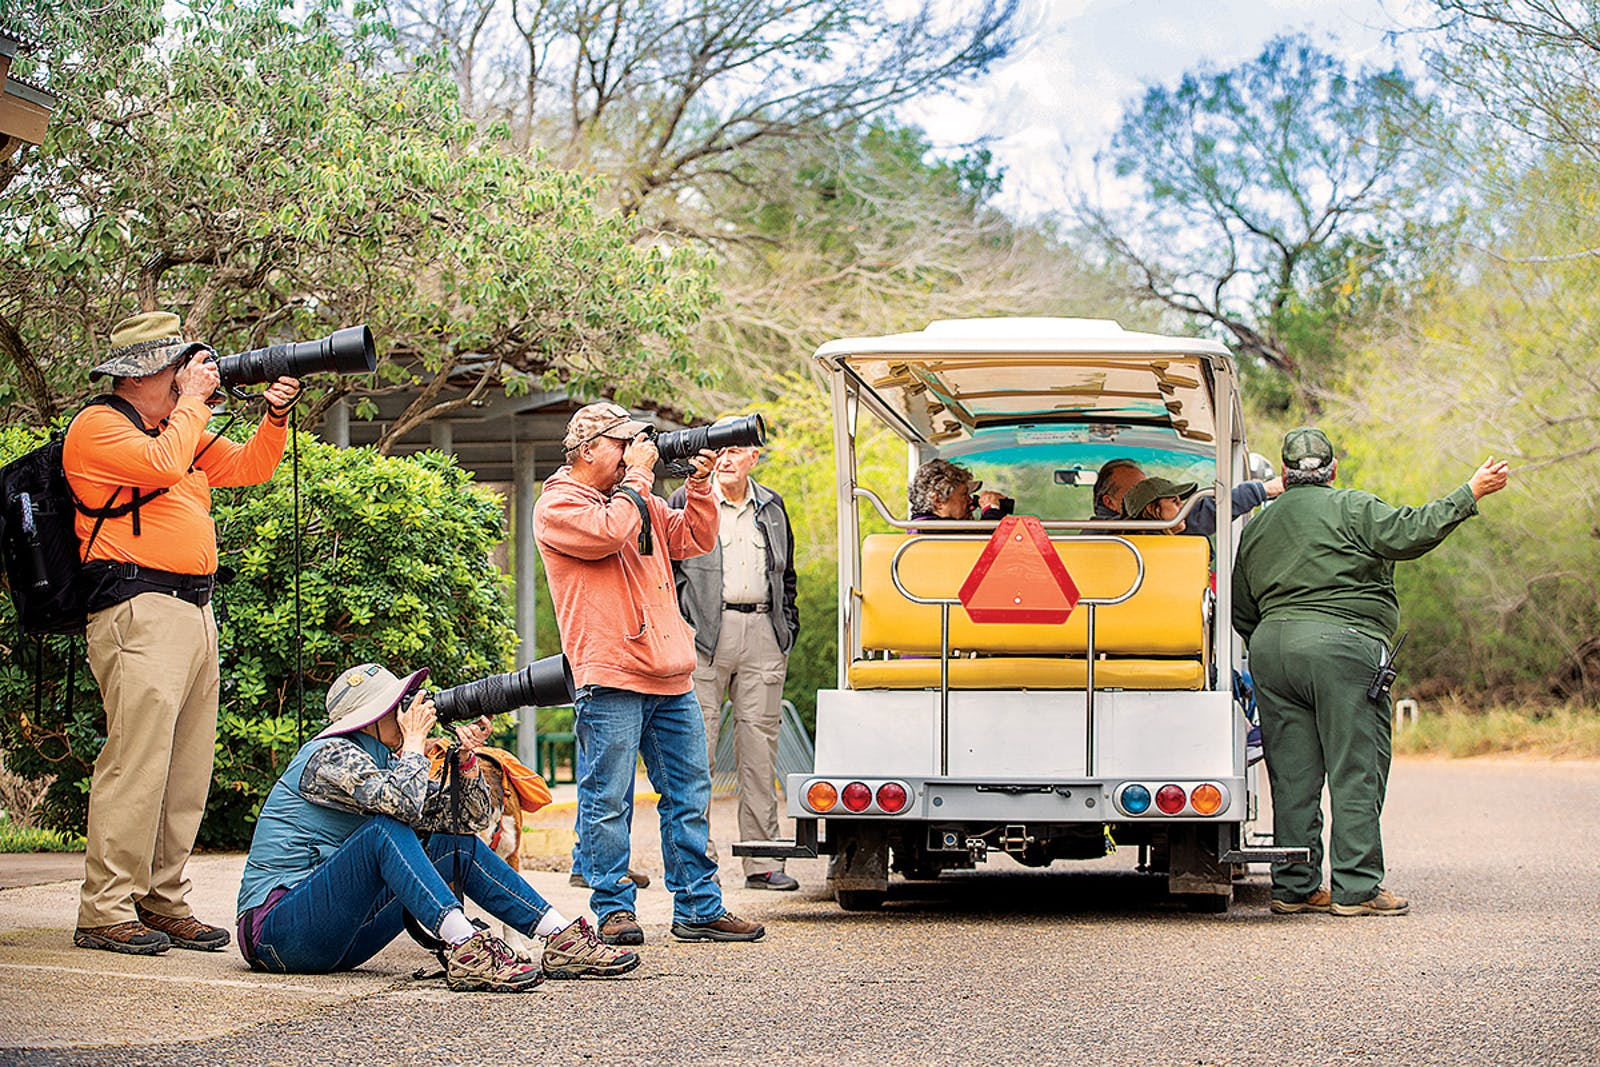 birders-taking-photos-bentsen-rio-grande-valley-state-park